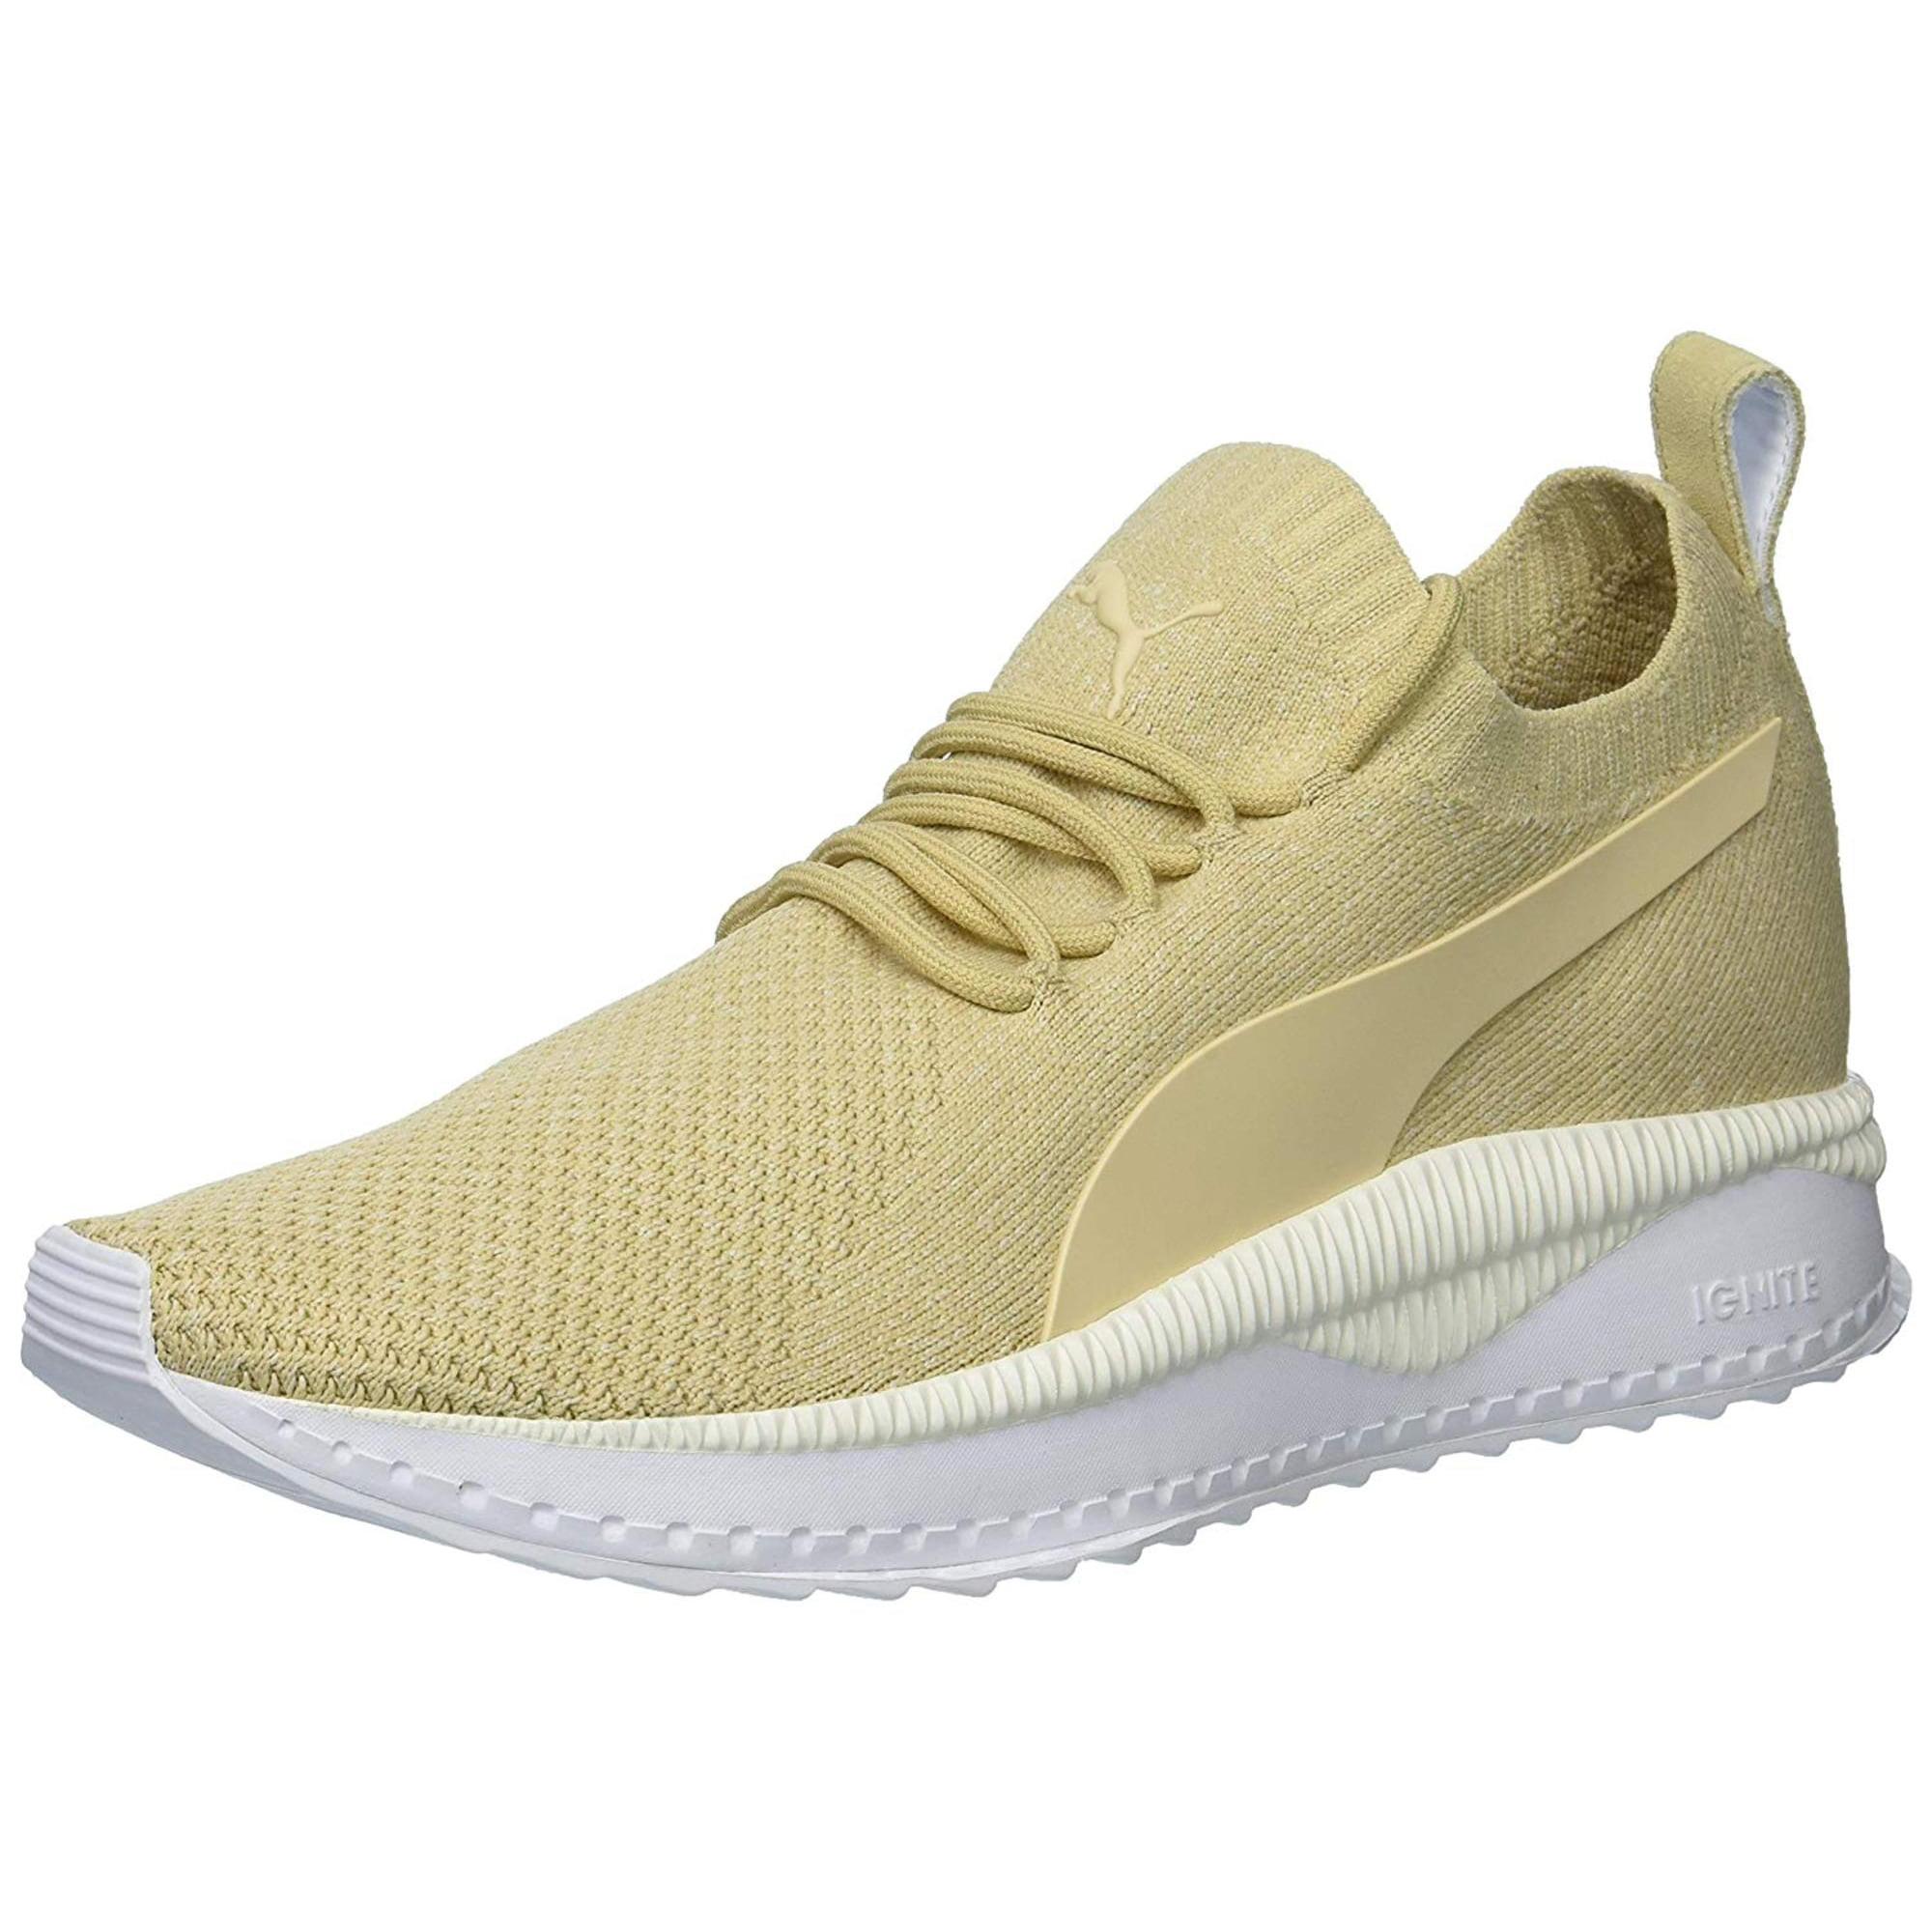 937c26bd9f PUMA Men's Tsugi Apex Evoknit Sneaker | Walmart Canada